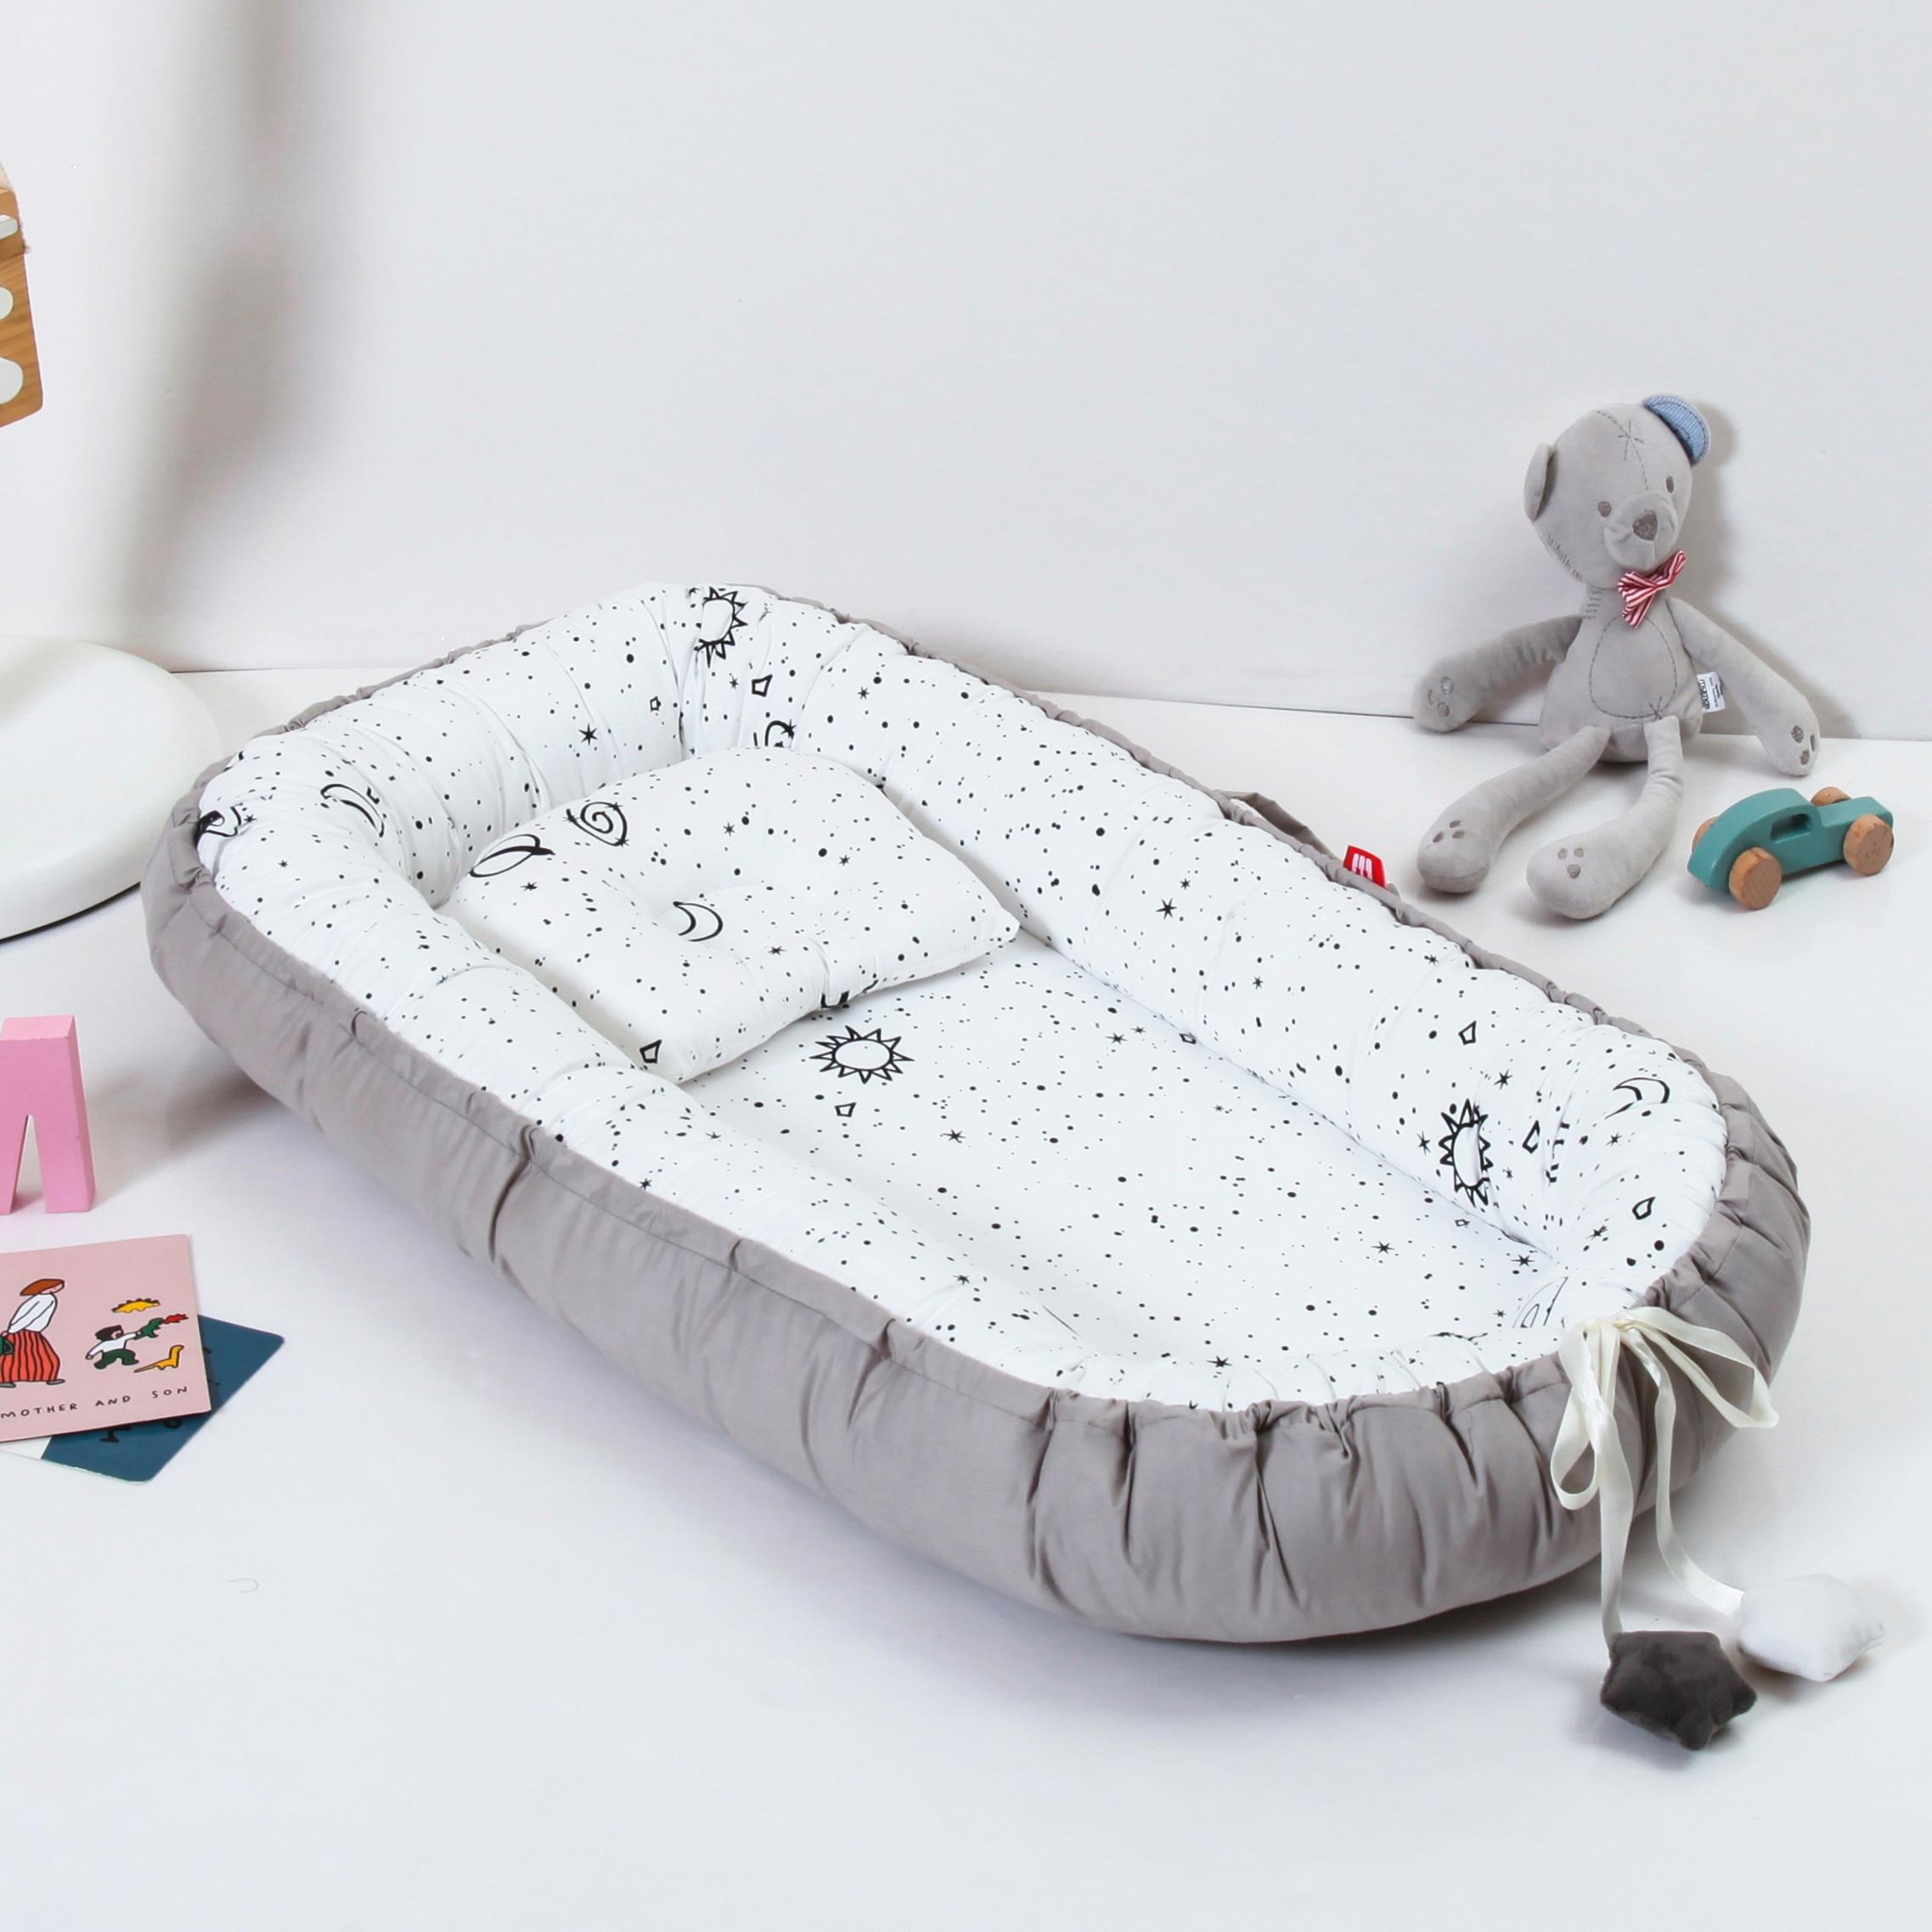 85X50cm Portable Baby Nest Newborn Crib Cradle Pillow Cushion Removable Bed Infant Cradle Cuna